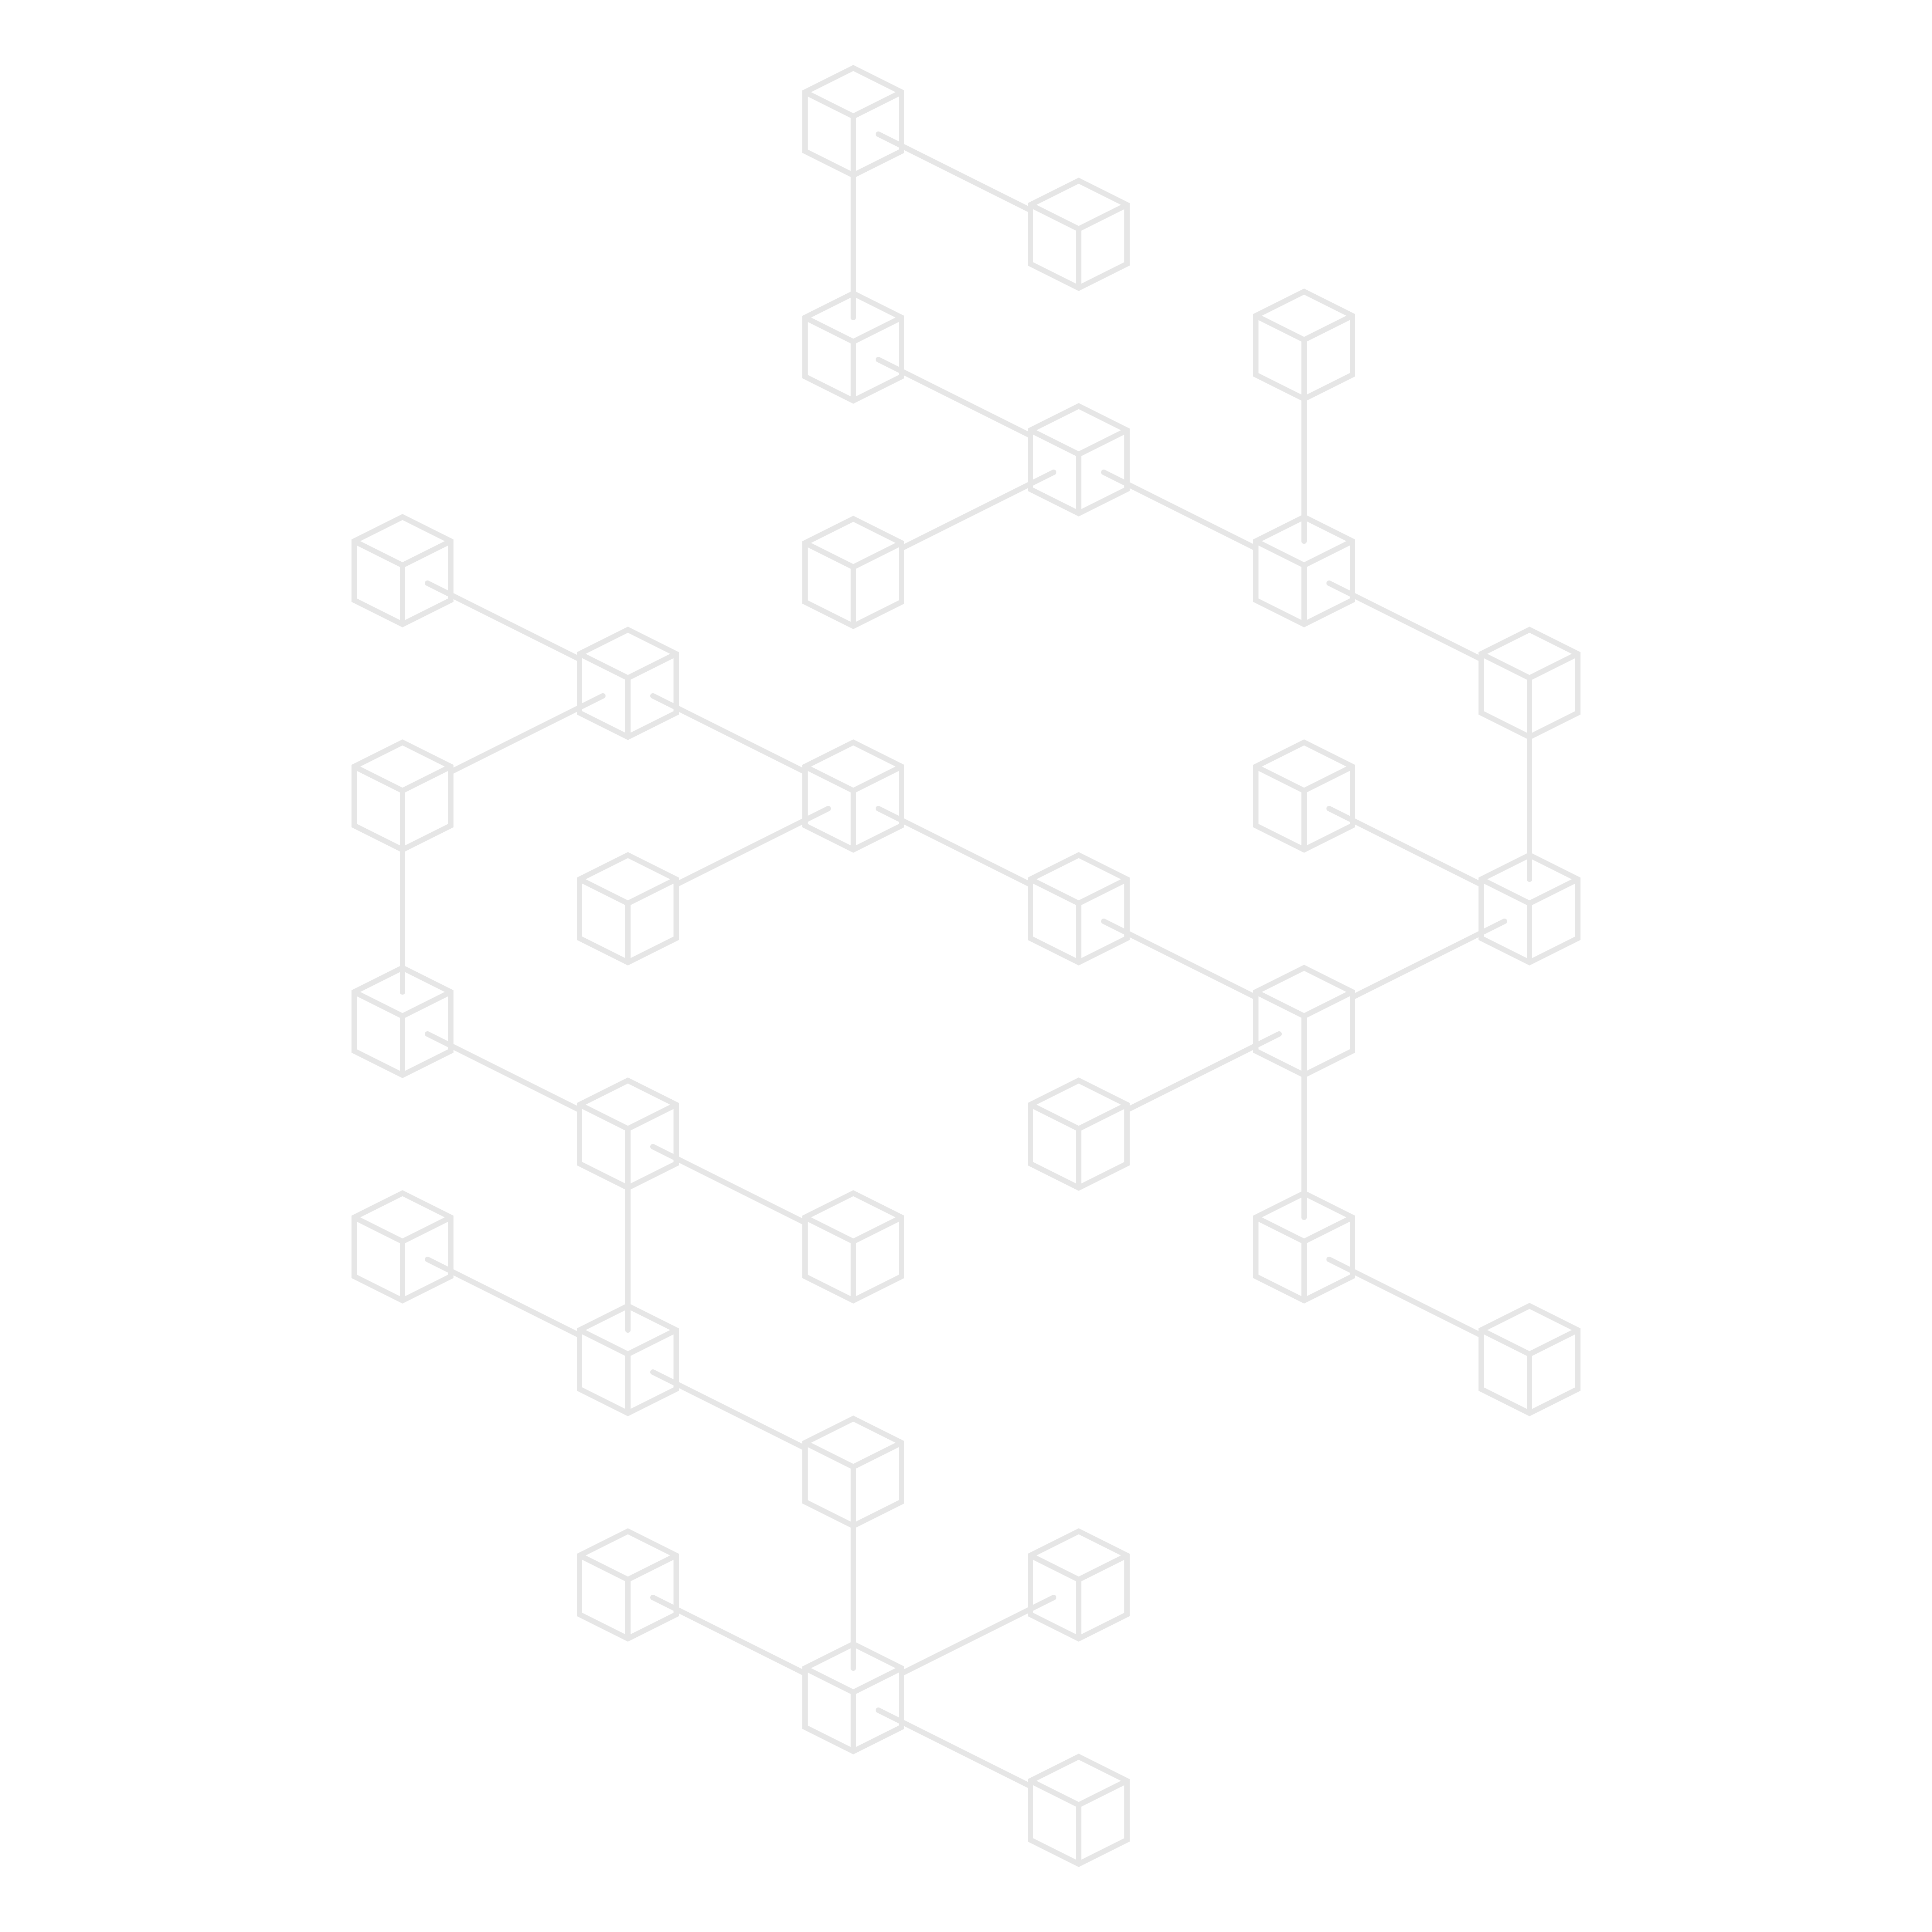 moneyclip-illustration-e